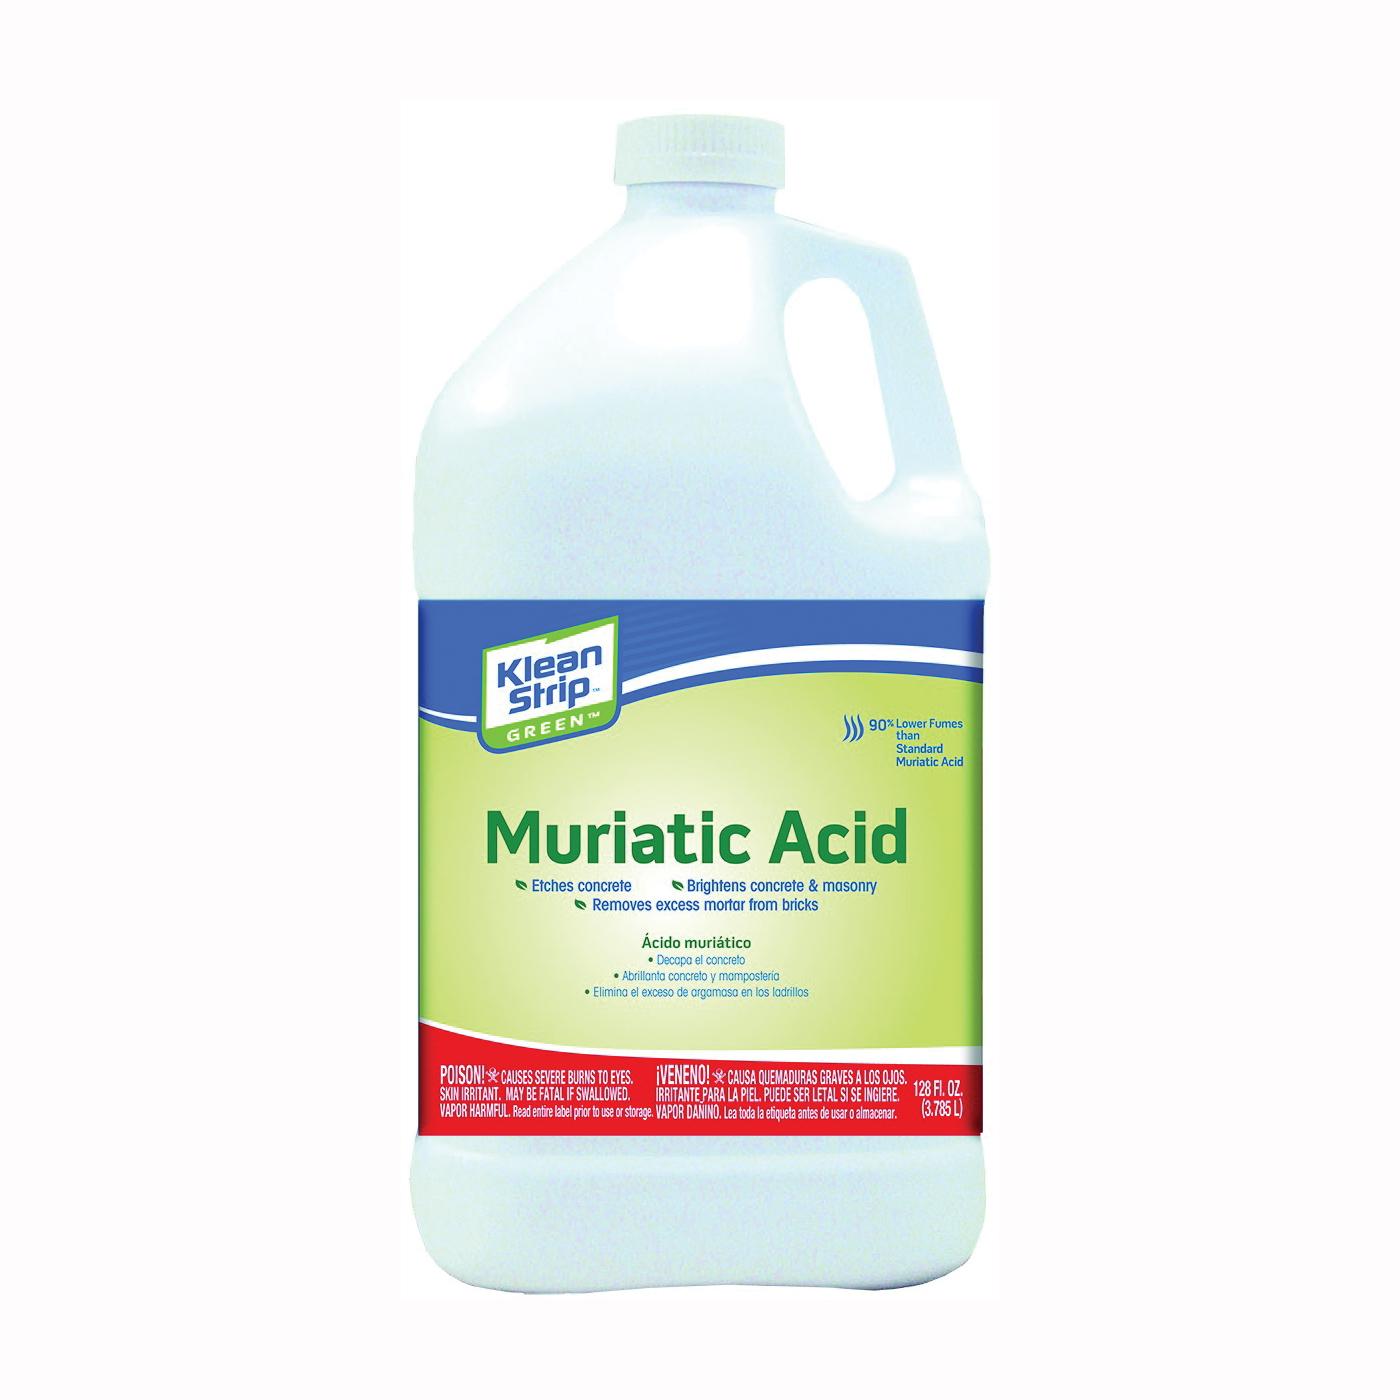 Picture of Klean Strip GKGM75006 Safer Muriatic Acid, Liquid, Slight Pungent, Pungent, 1 gal, Can